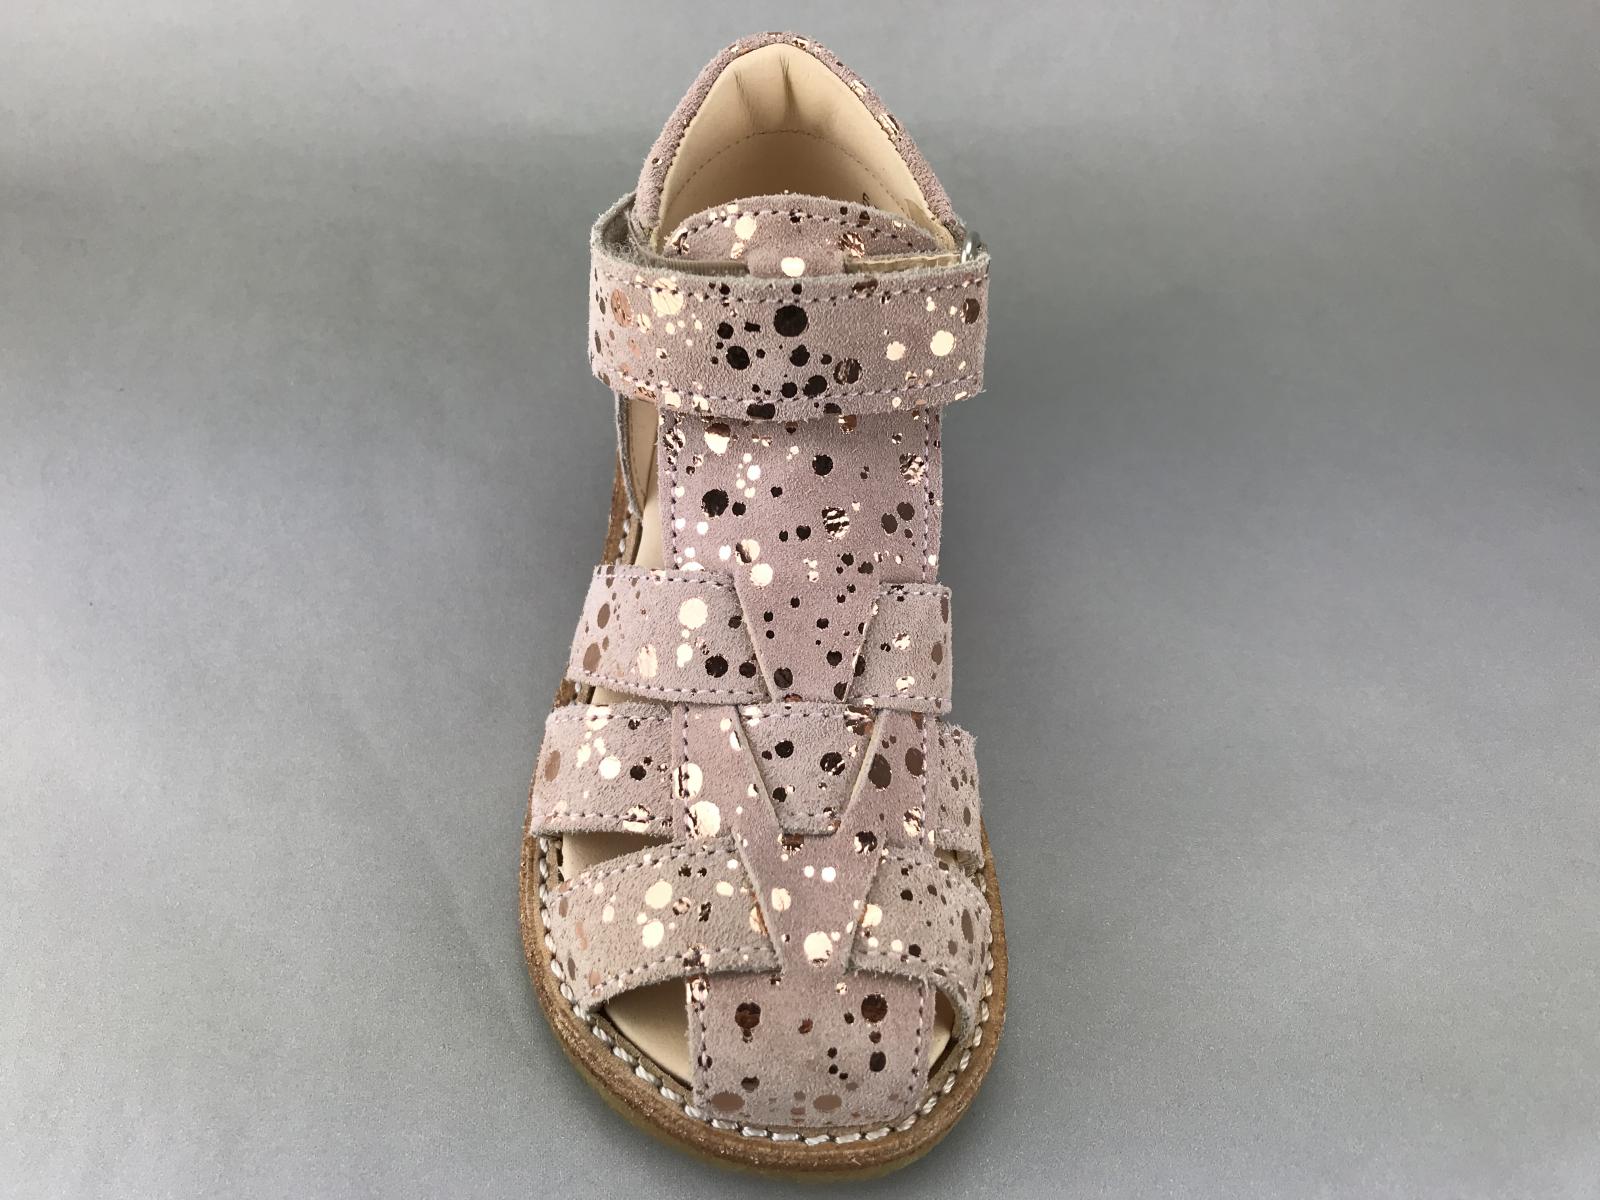 466e3a8e15f1 Angulus pige sandal - rosa m. prikker - BØRN - zjoos-hjoerring.dk